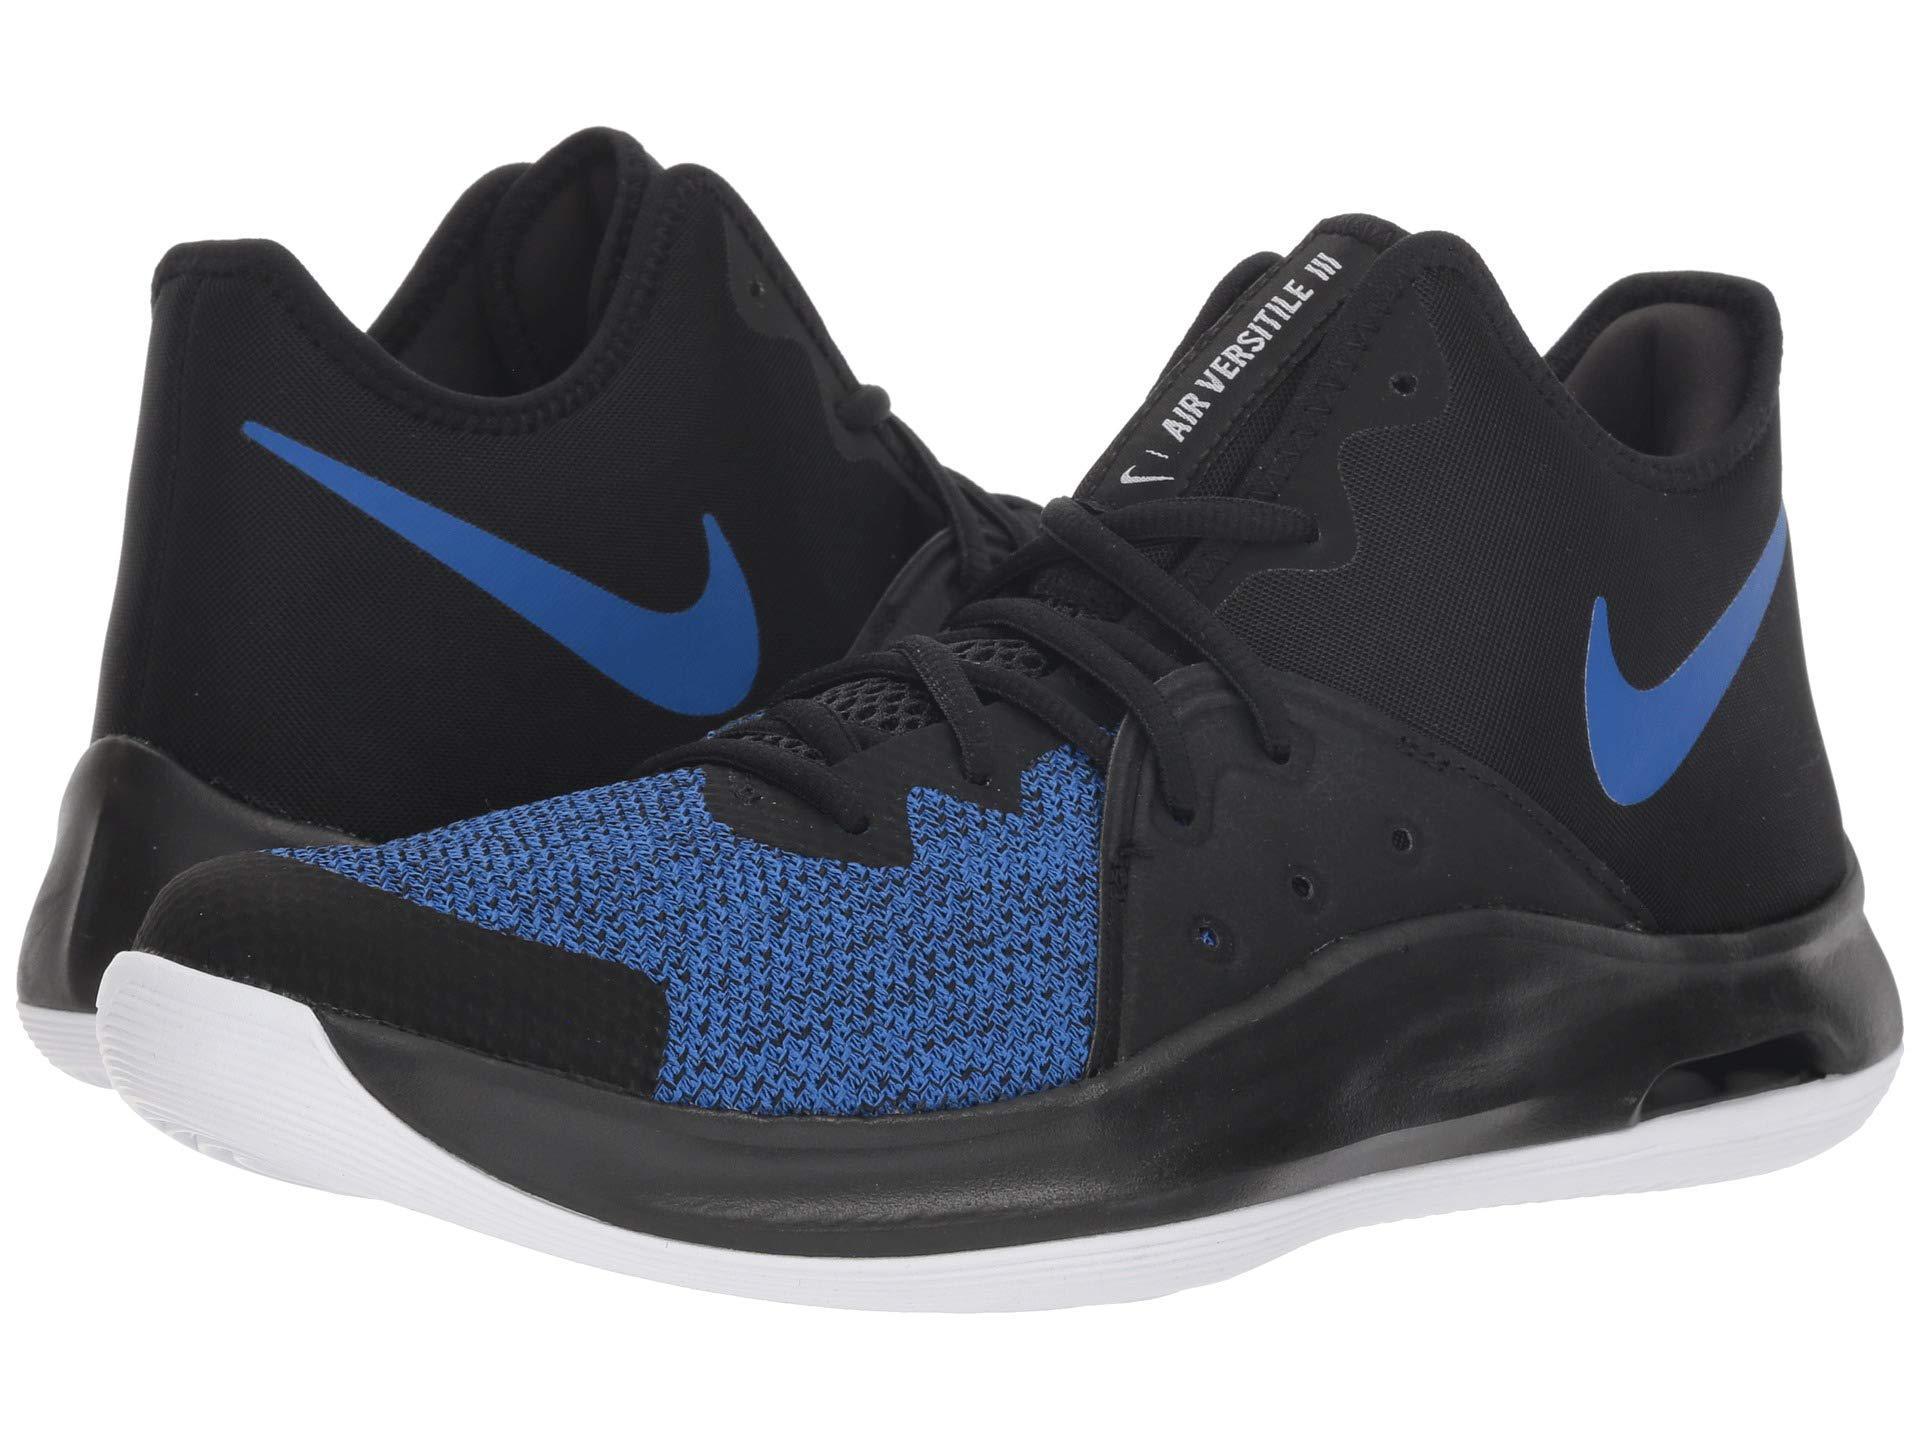 newest 65f99 35015 Nike Air Versitile Iii (black black white dark Grey) Basketball ...